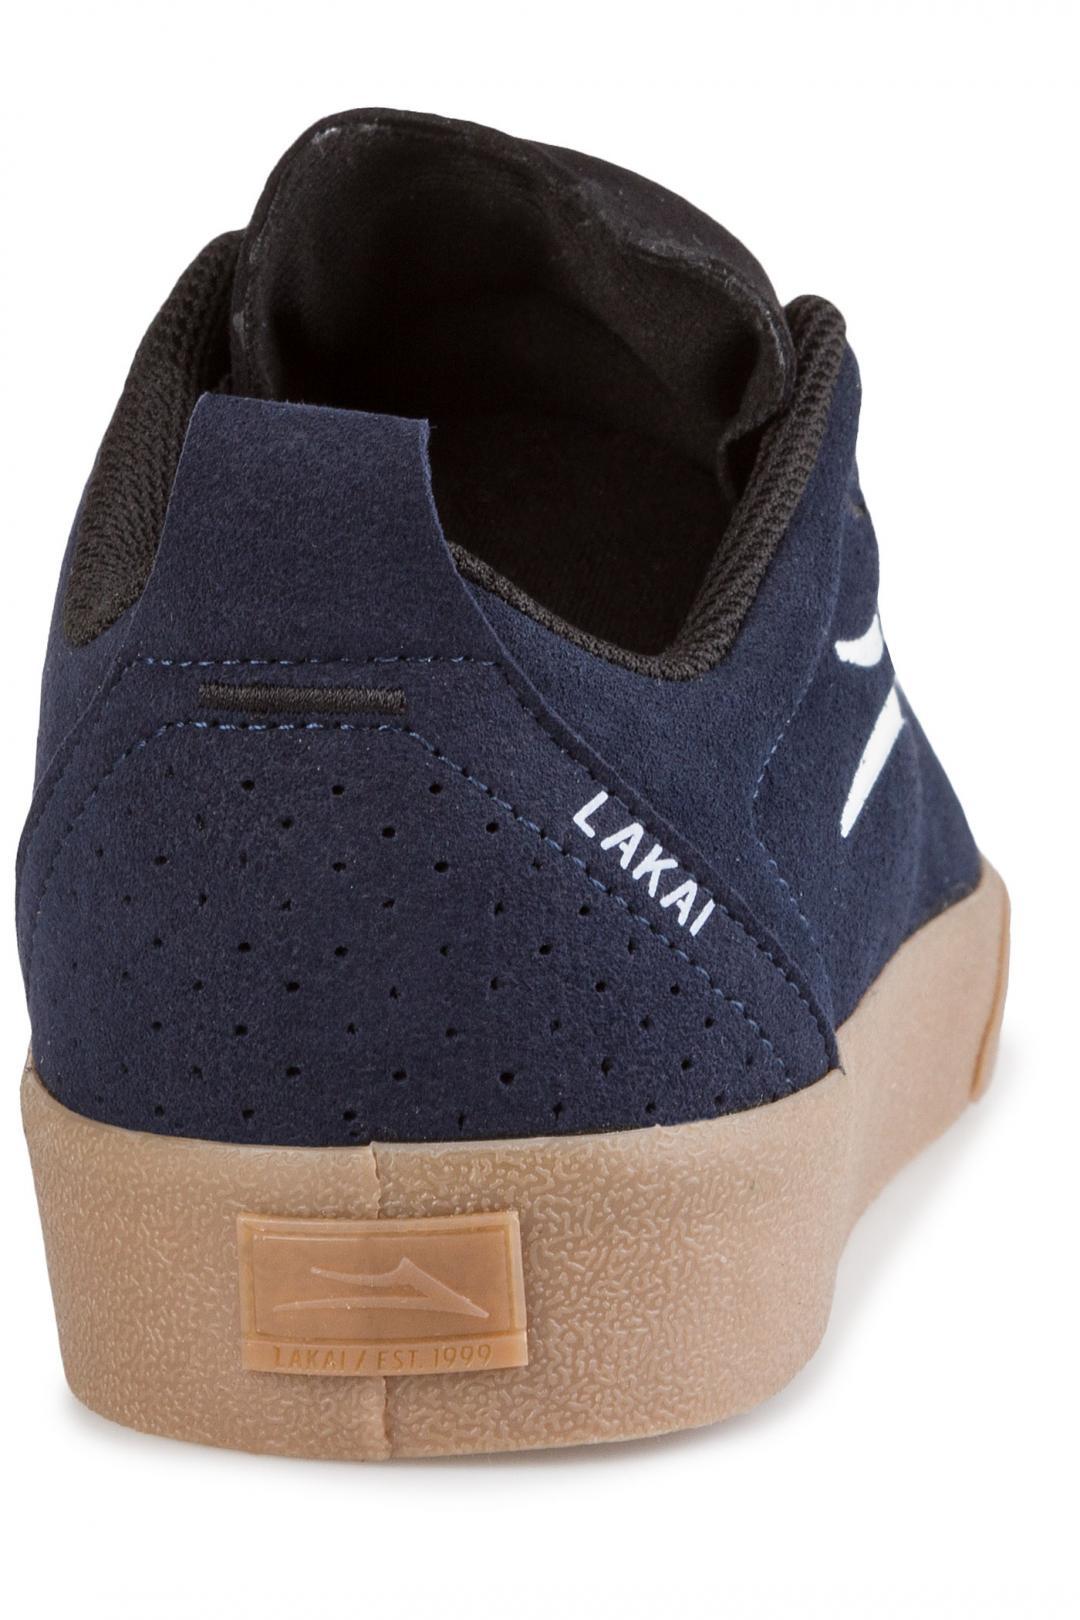 Uomo Lakai Bristol Suede navy gum | Sneakers low top